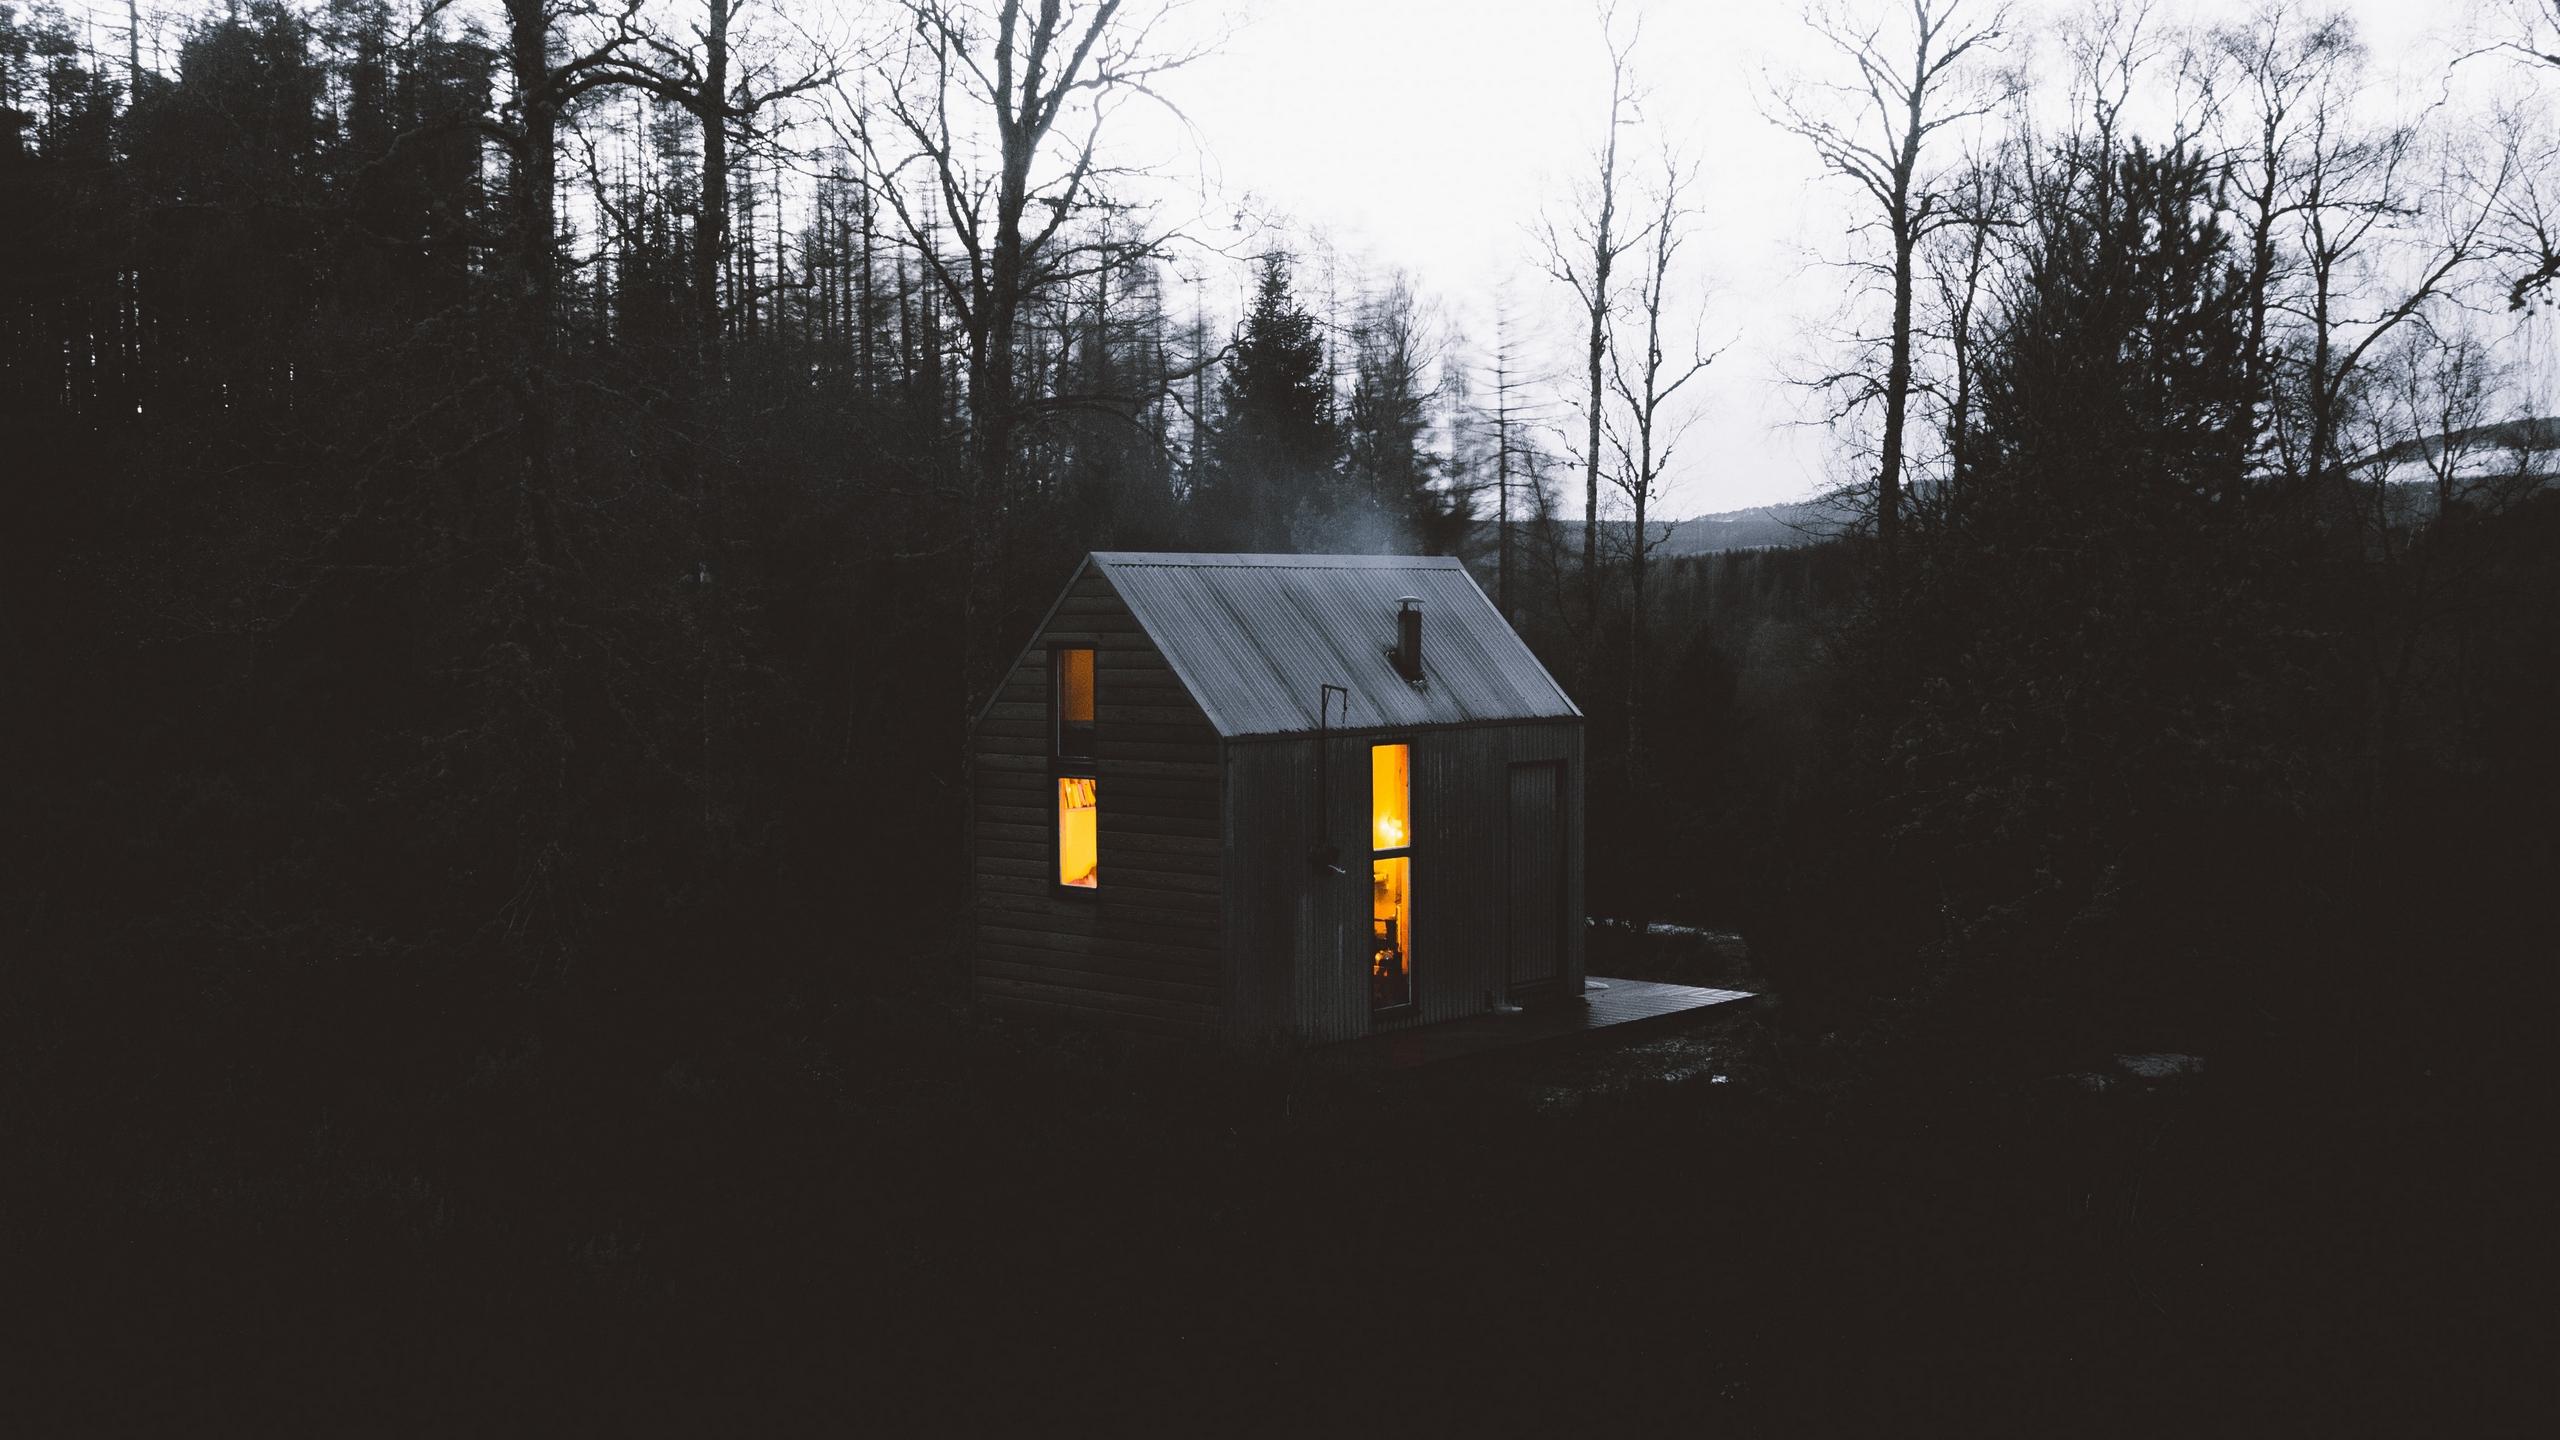 General 2560x1440 landscape trees forest house shack dark filter cabin deep forest